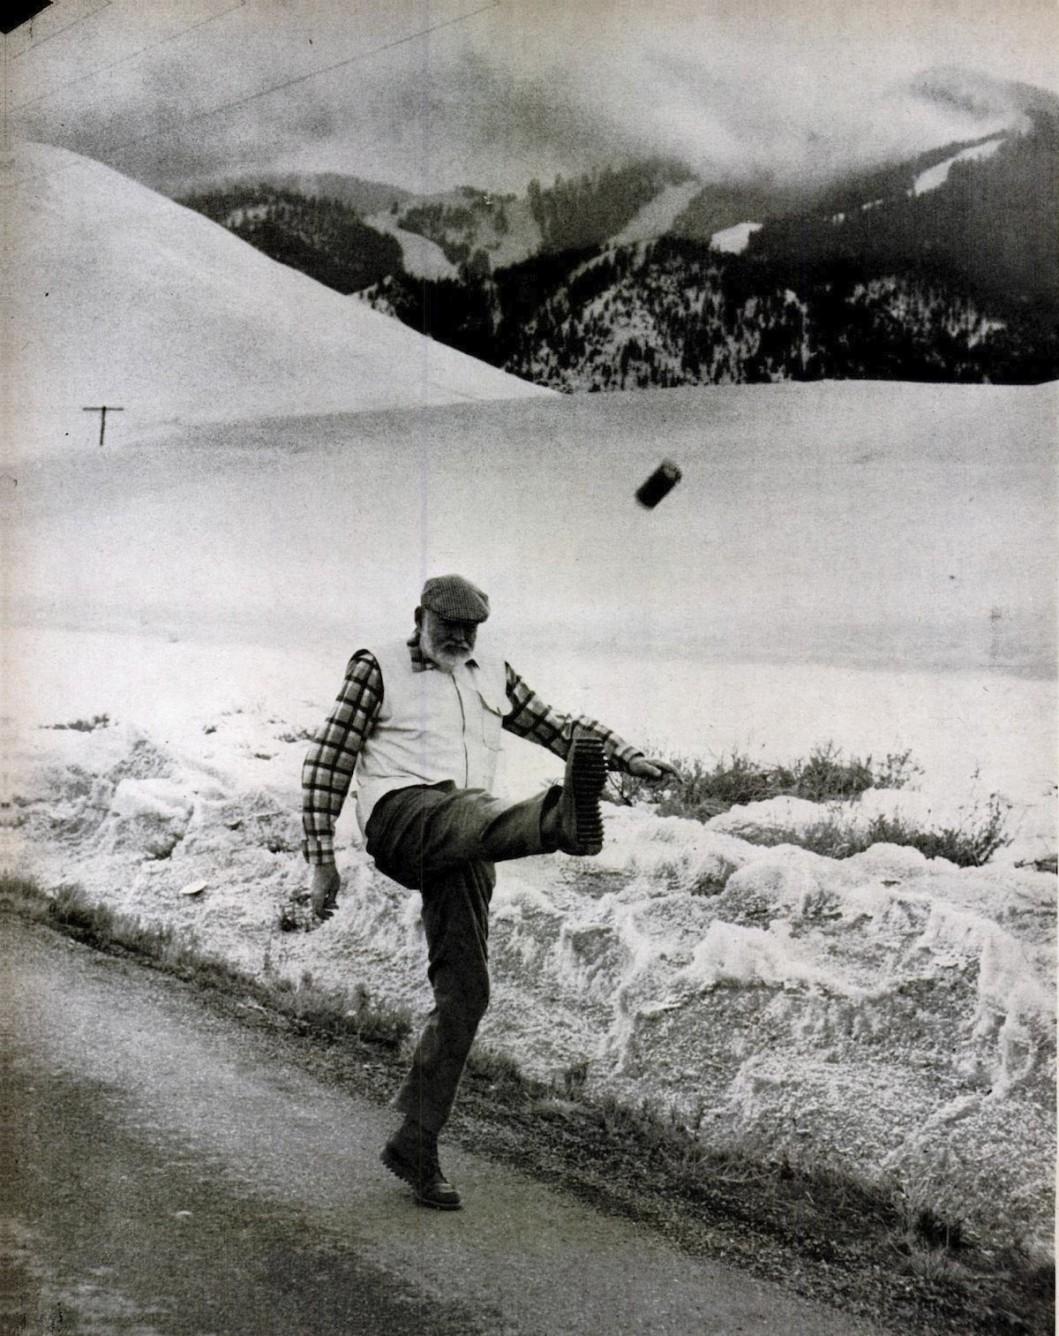 BRYSON_1959_Hemingway_kicks_can